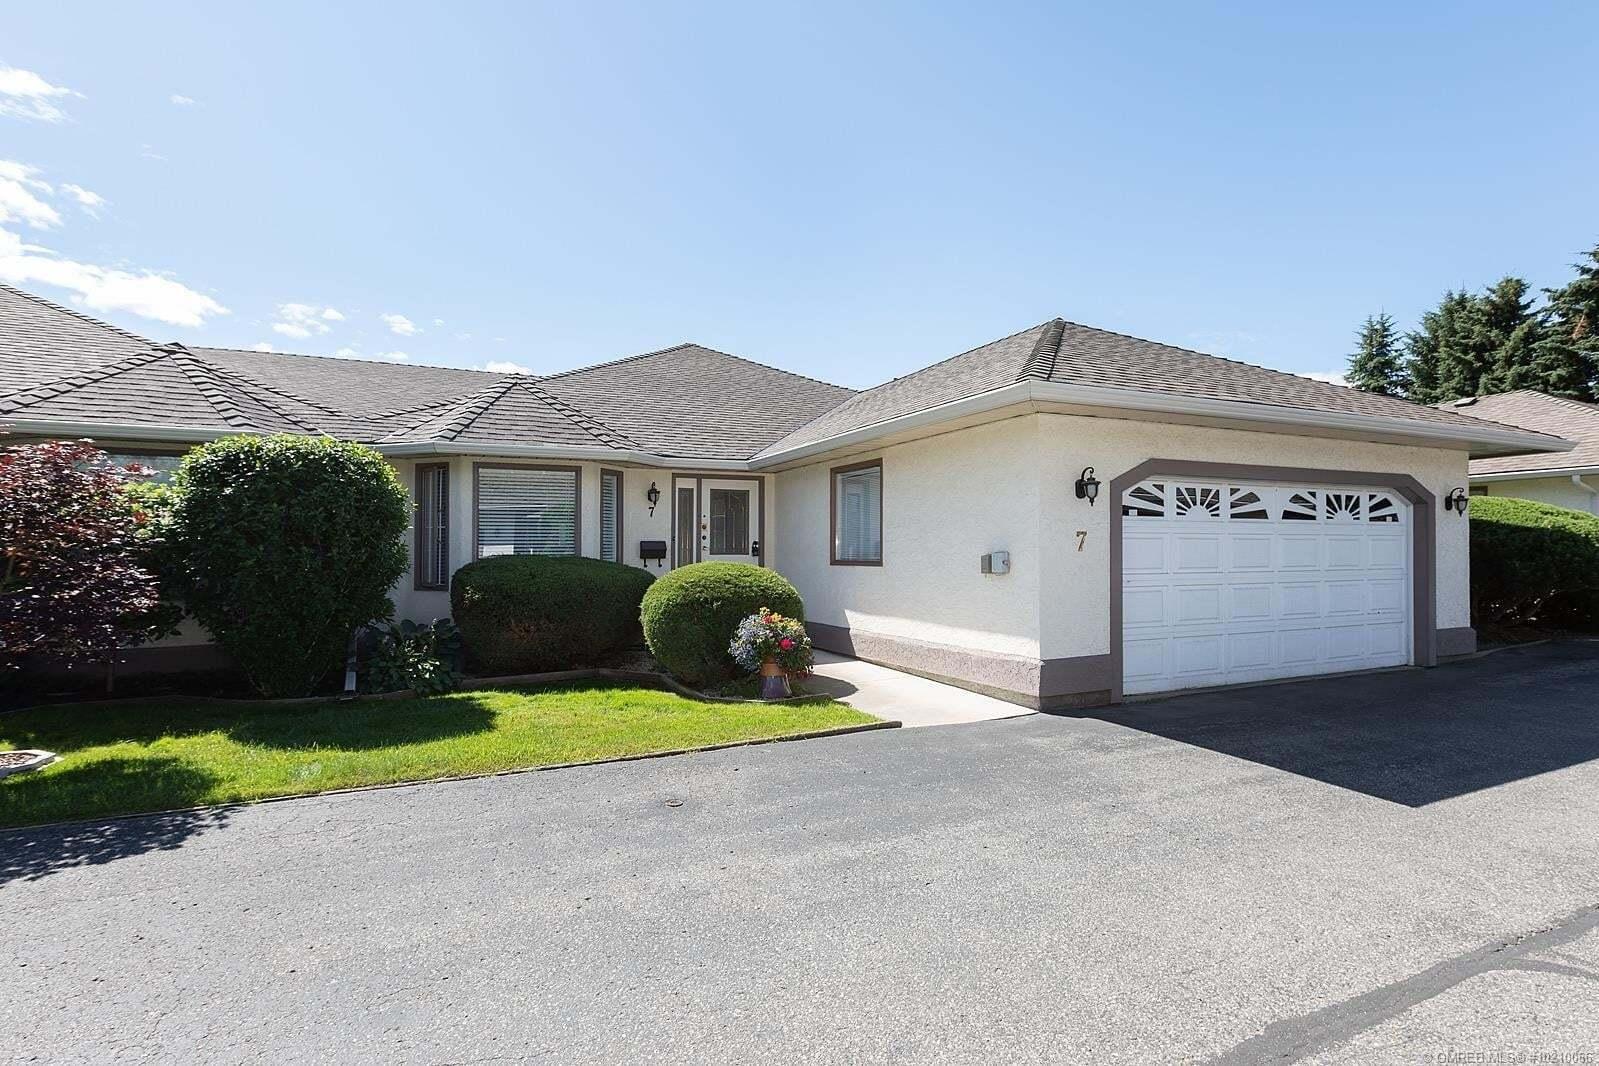 Townhouse for sale at 715 Barrera Rd Kelowna British Columbia - MLS: 10210066